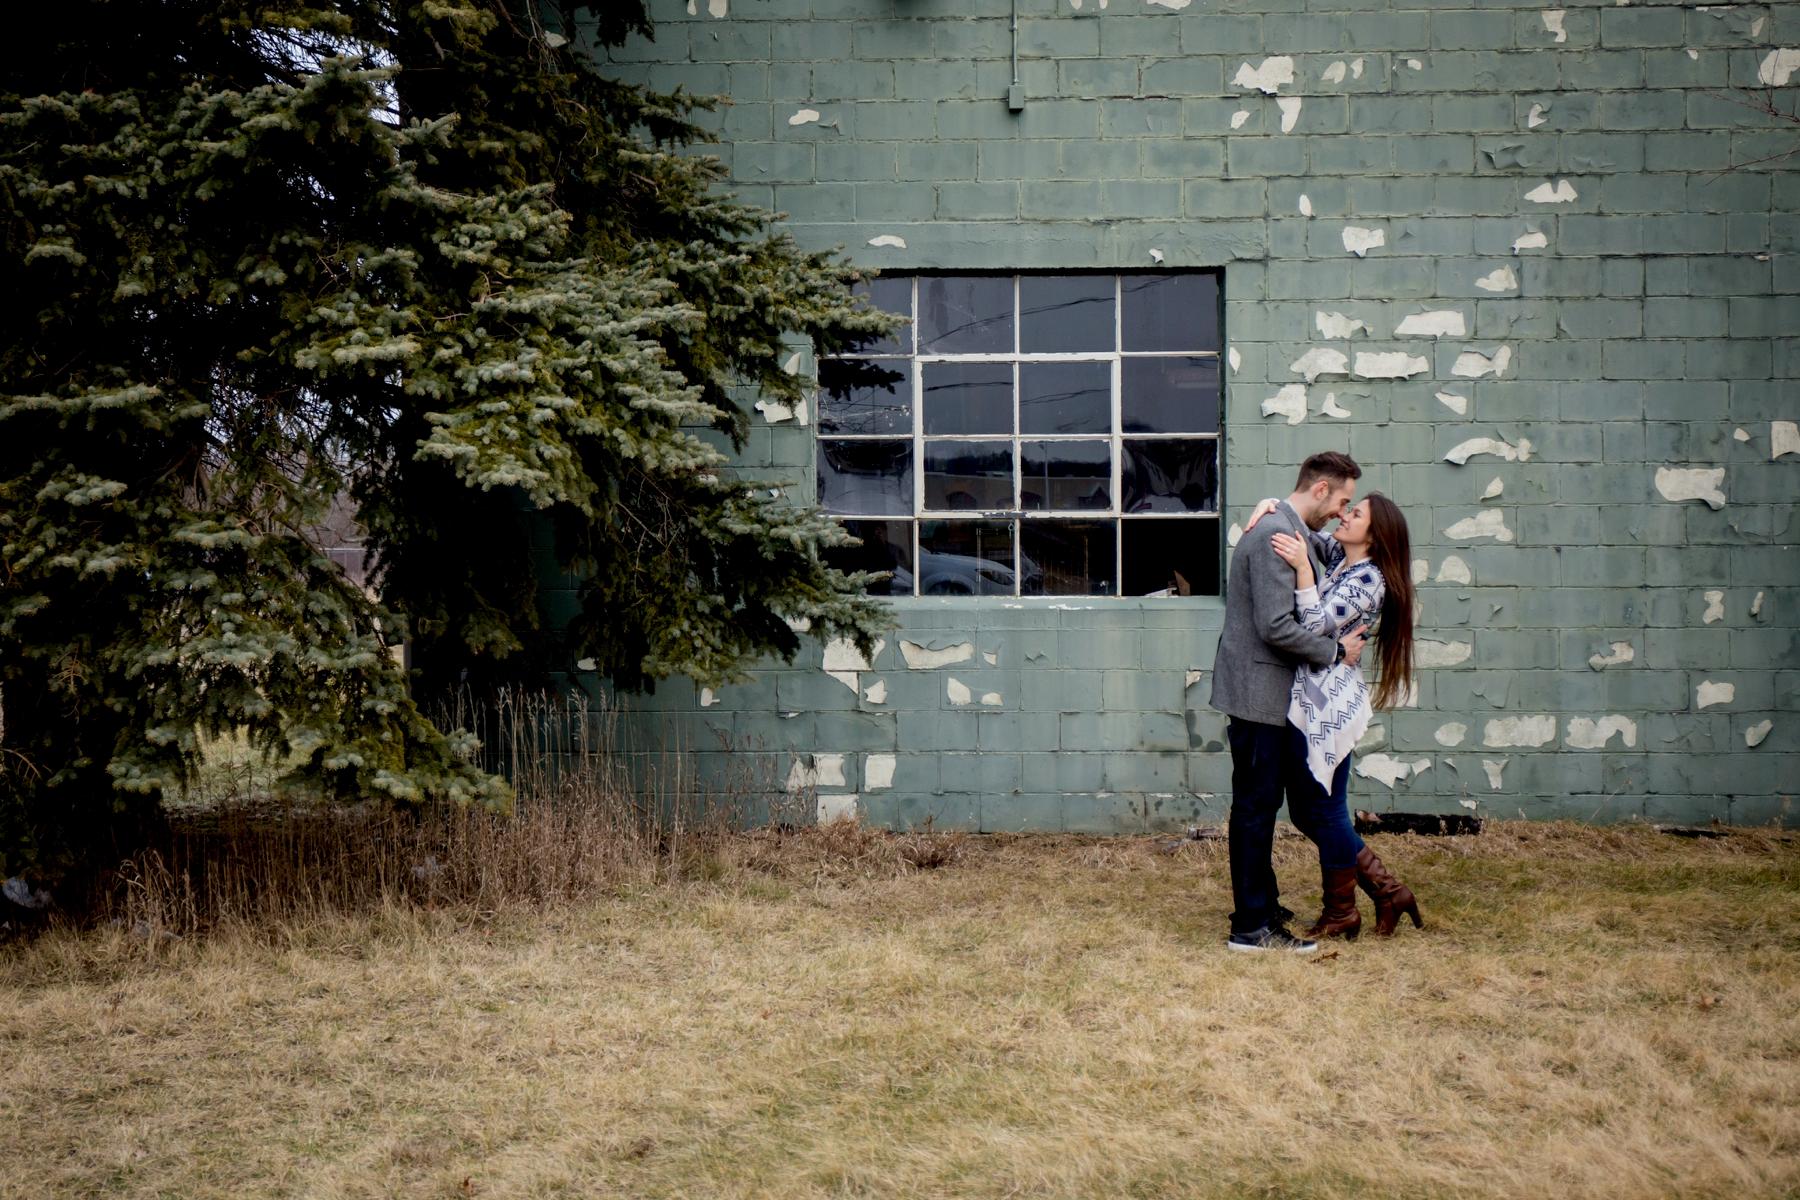 Brandon_Shafer_Photography_Kim_Nick_Engagement_0021.jpg